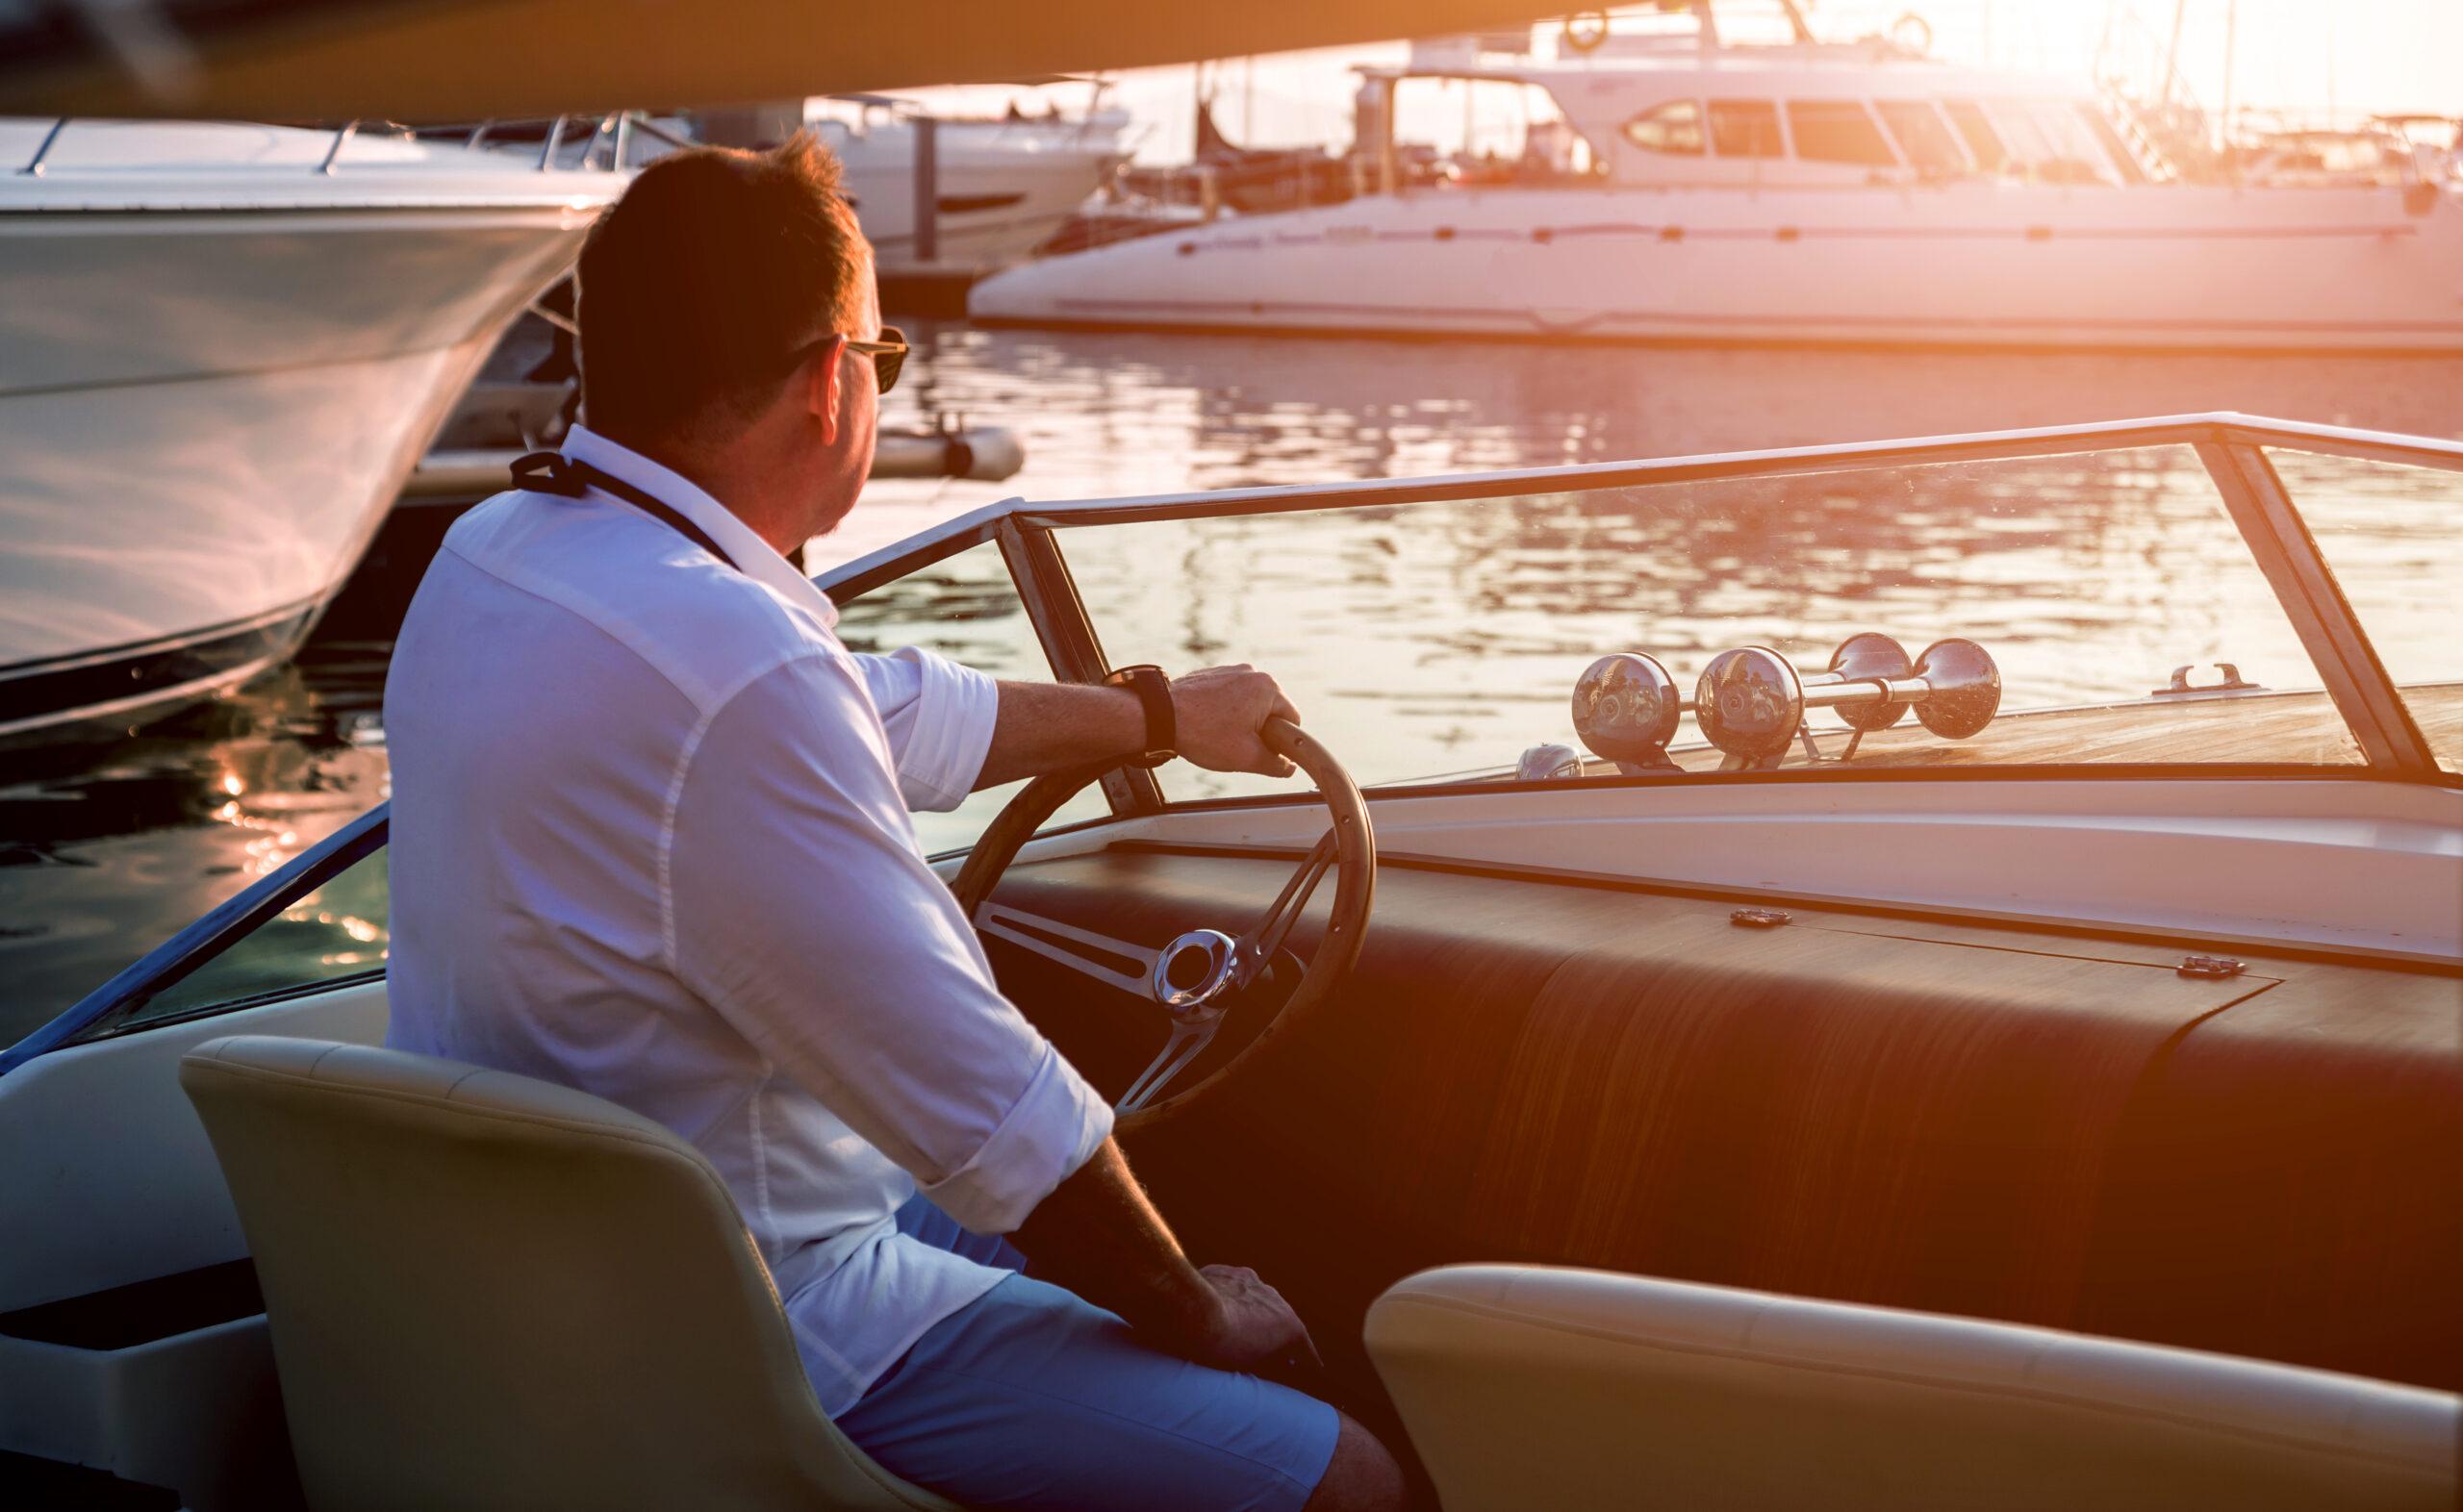 Cobertura de seguros para empresas náuticas:Defensa Jurídica